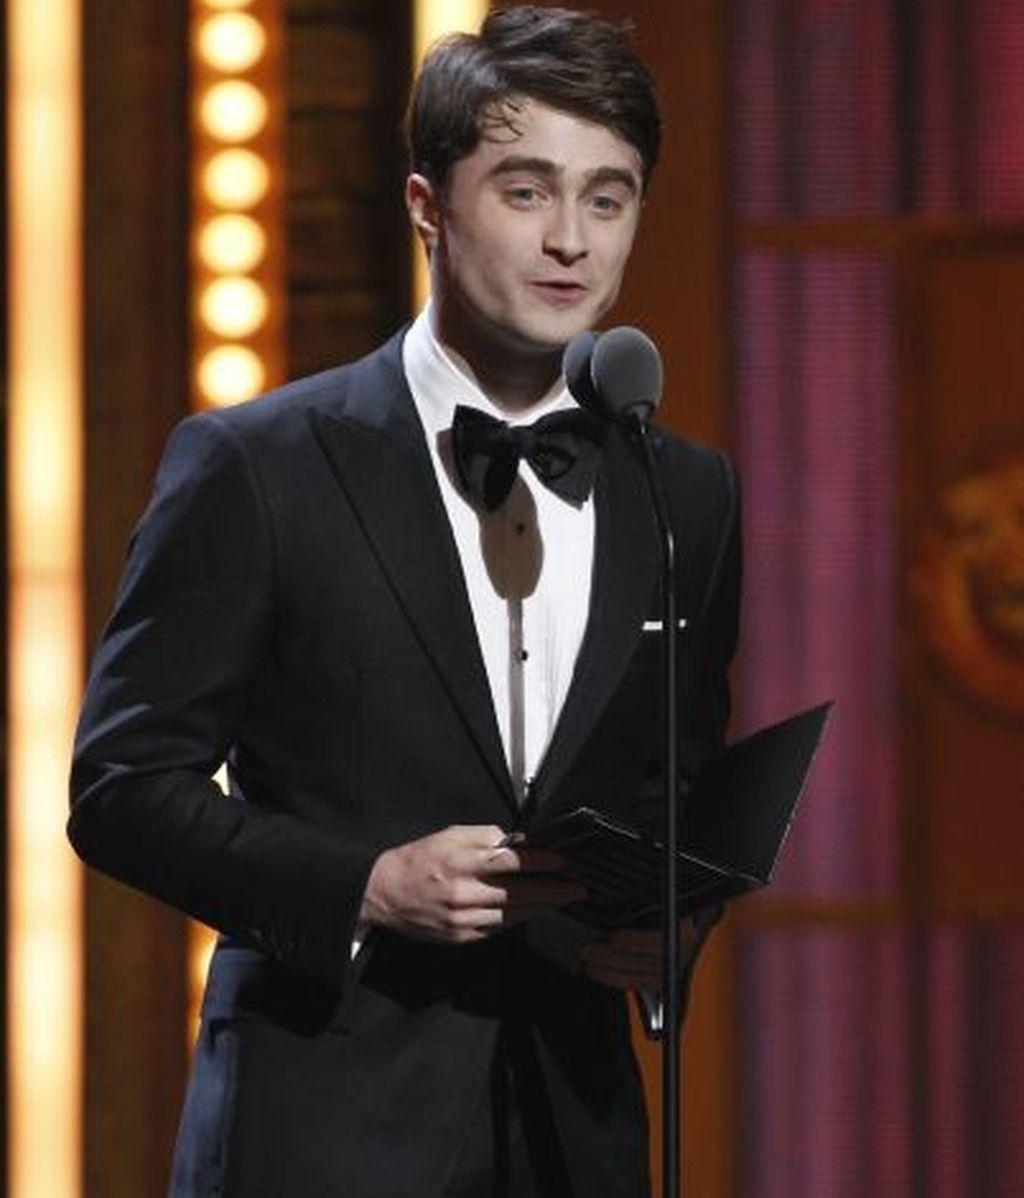 Daniel Radcliffe presentó parte de la gala